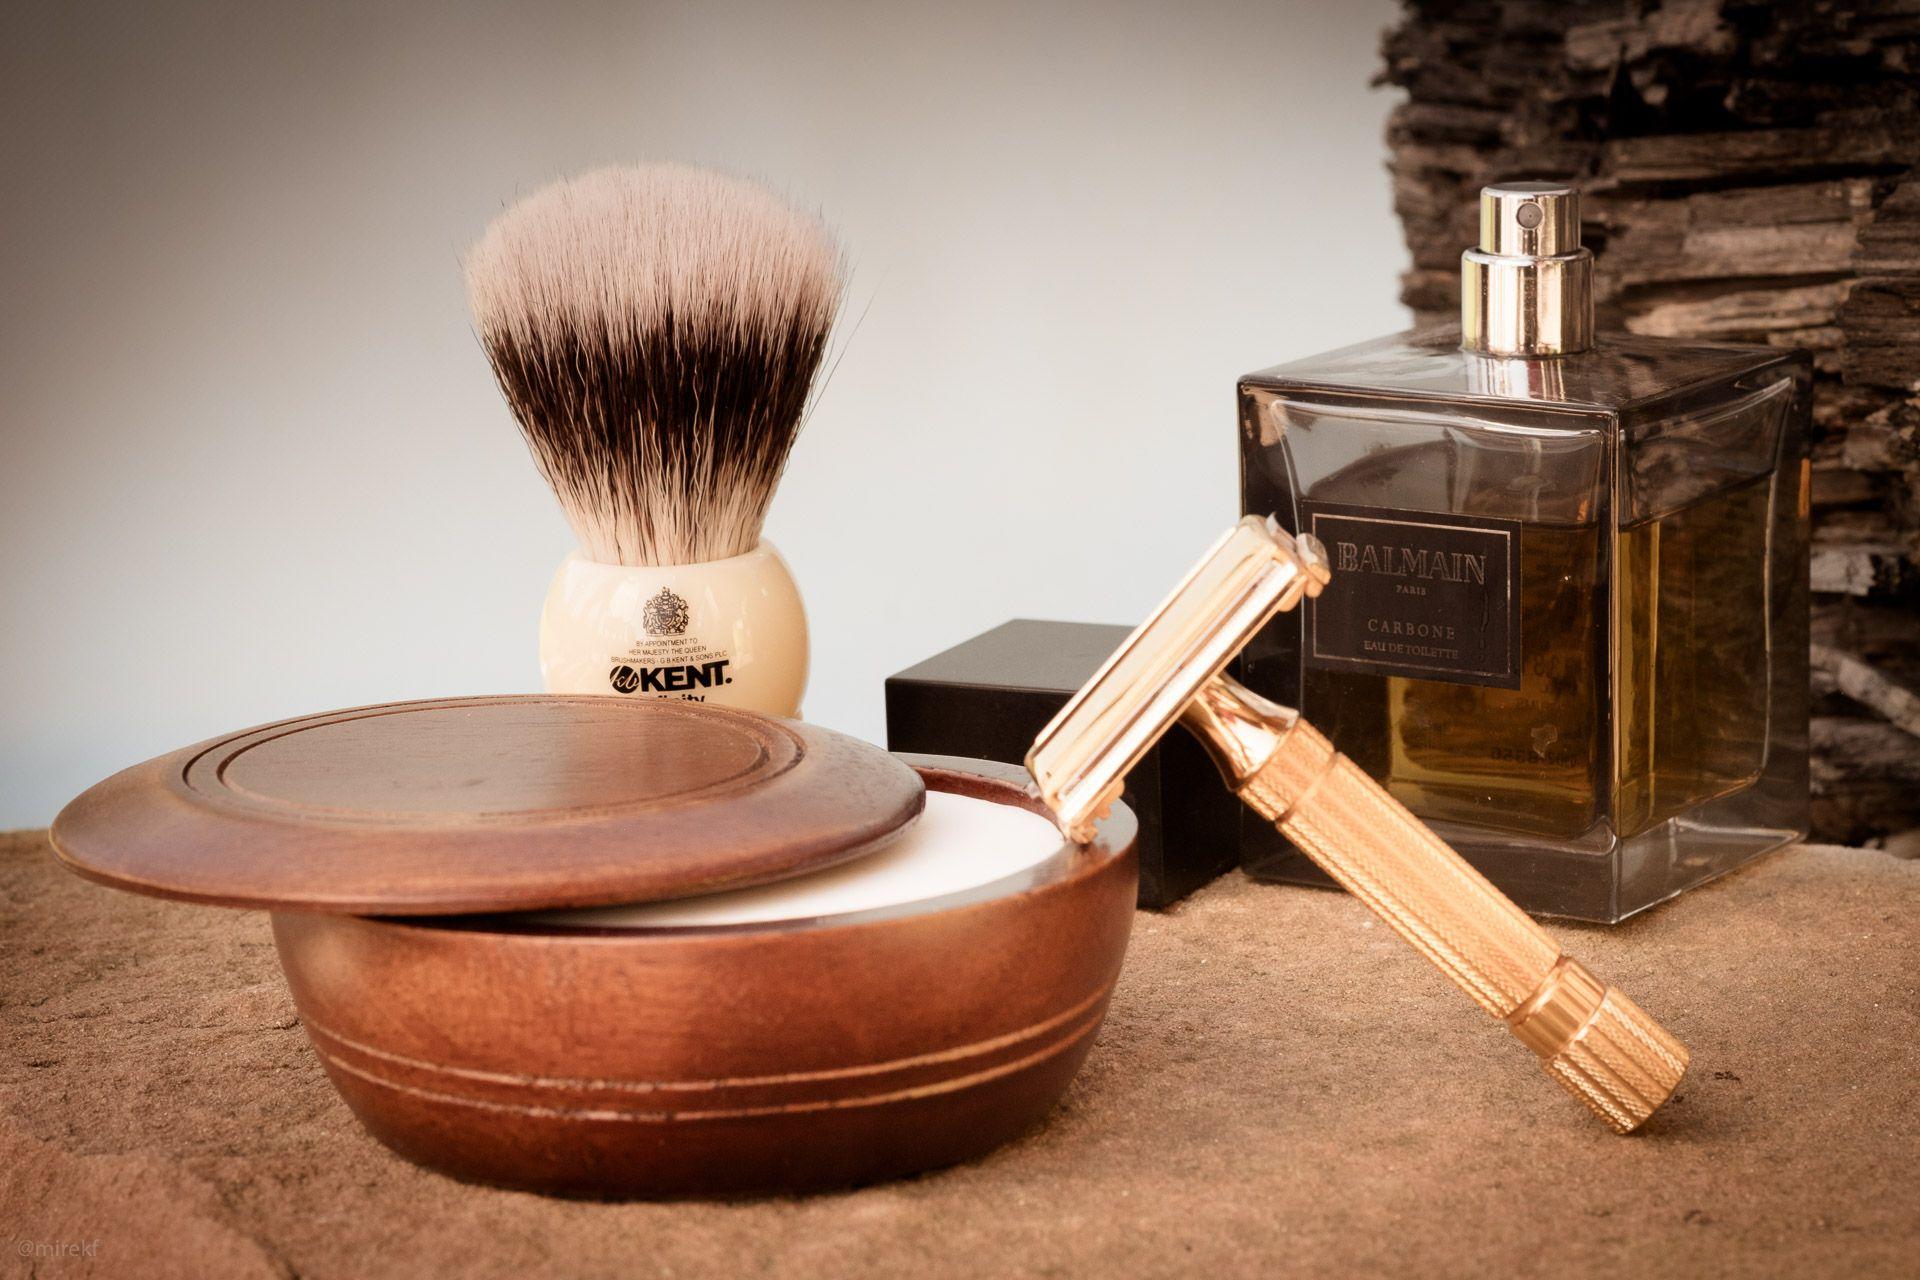 arran-driftwood-soap-scenka